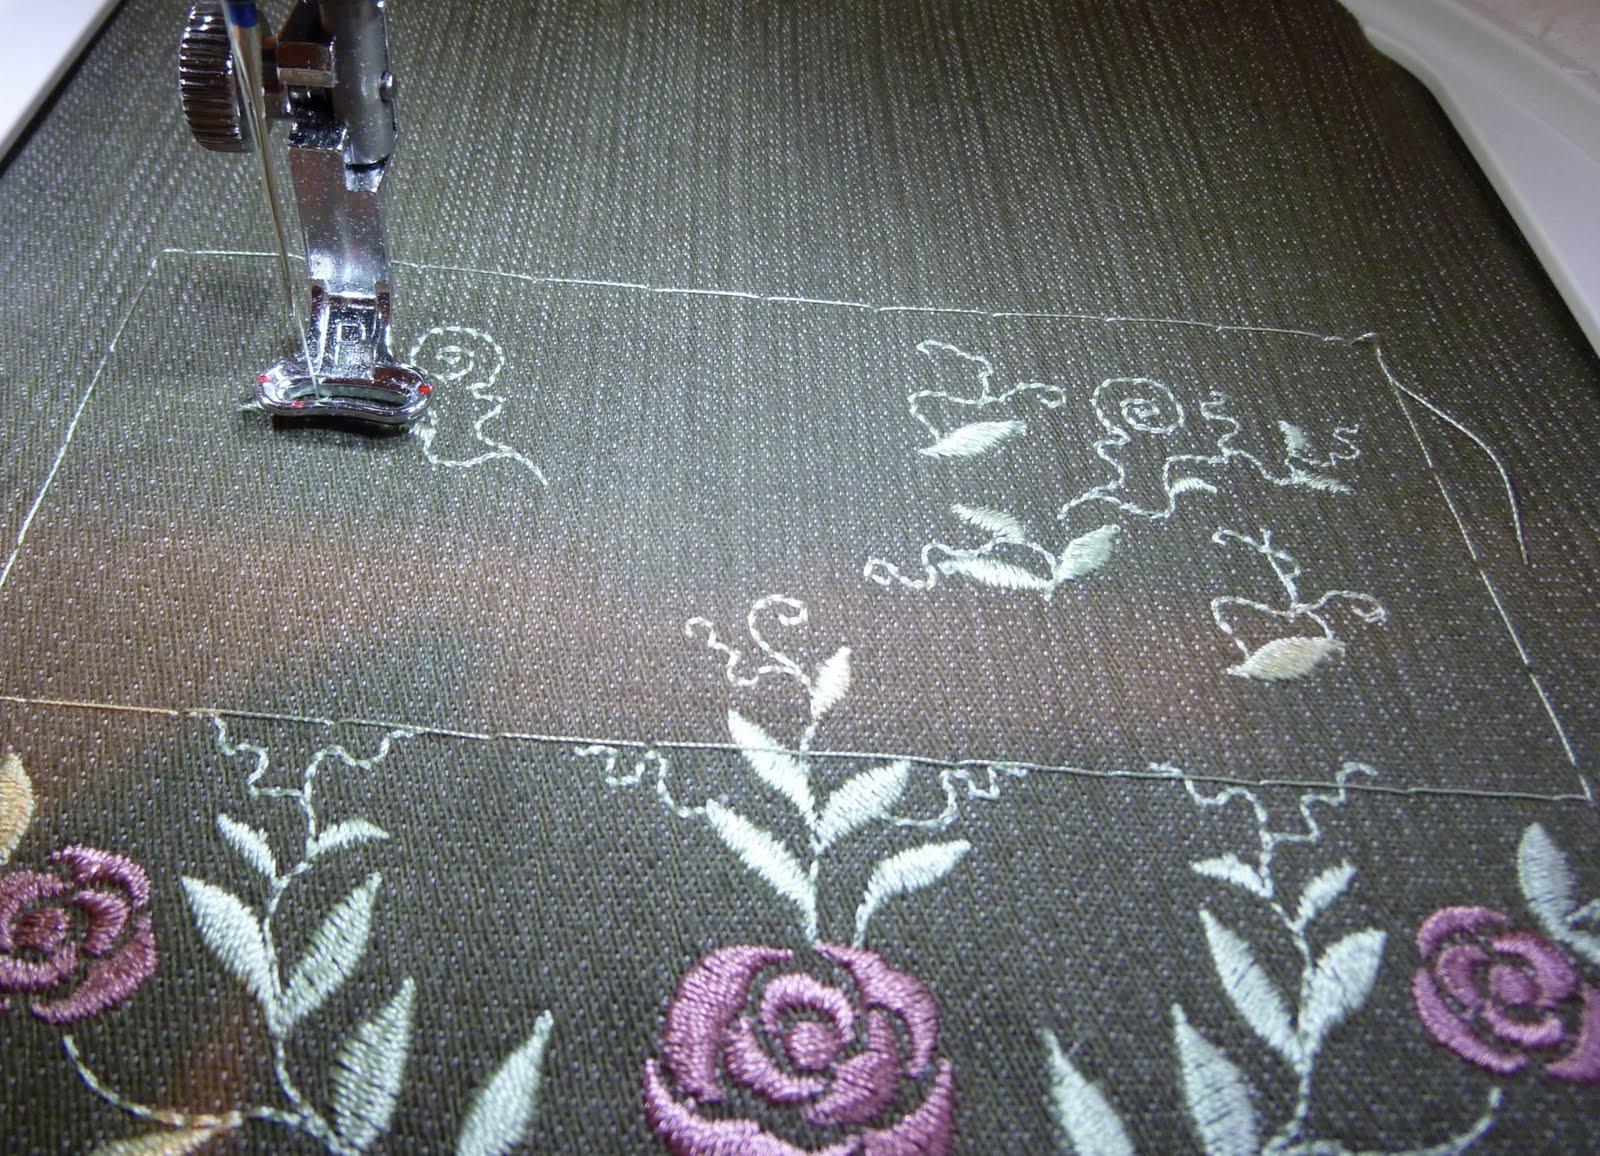 Janome memory craft 12000 - Horizon Memory Craft 12000 Janome Horizon Memory Craft 12000 Here You Can See Me Embroidering